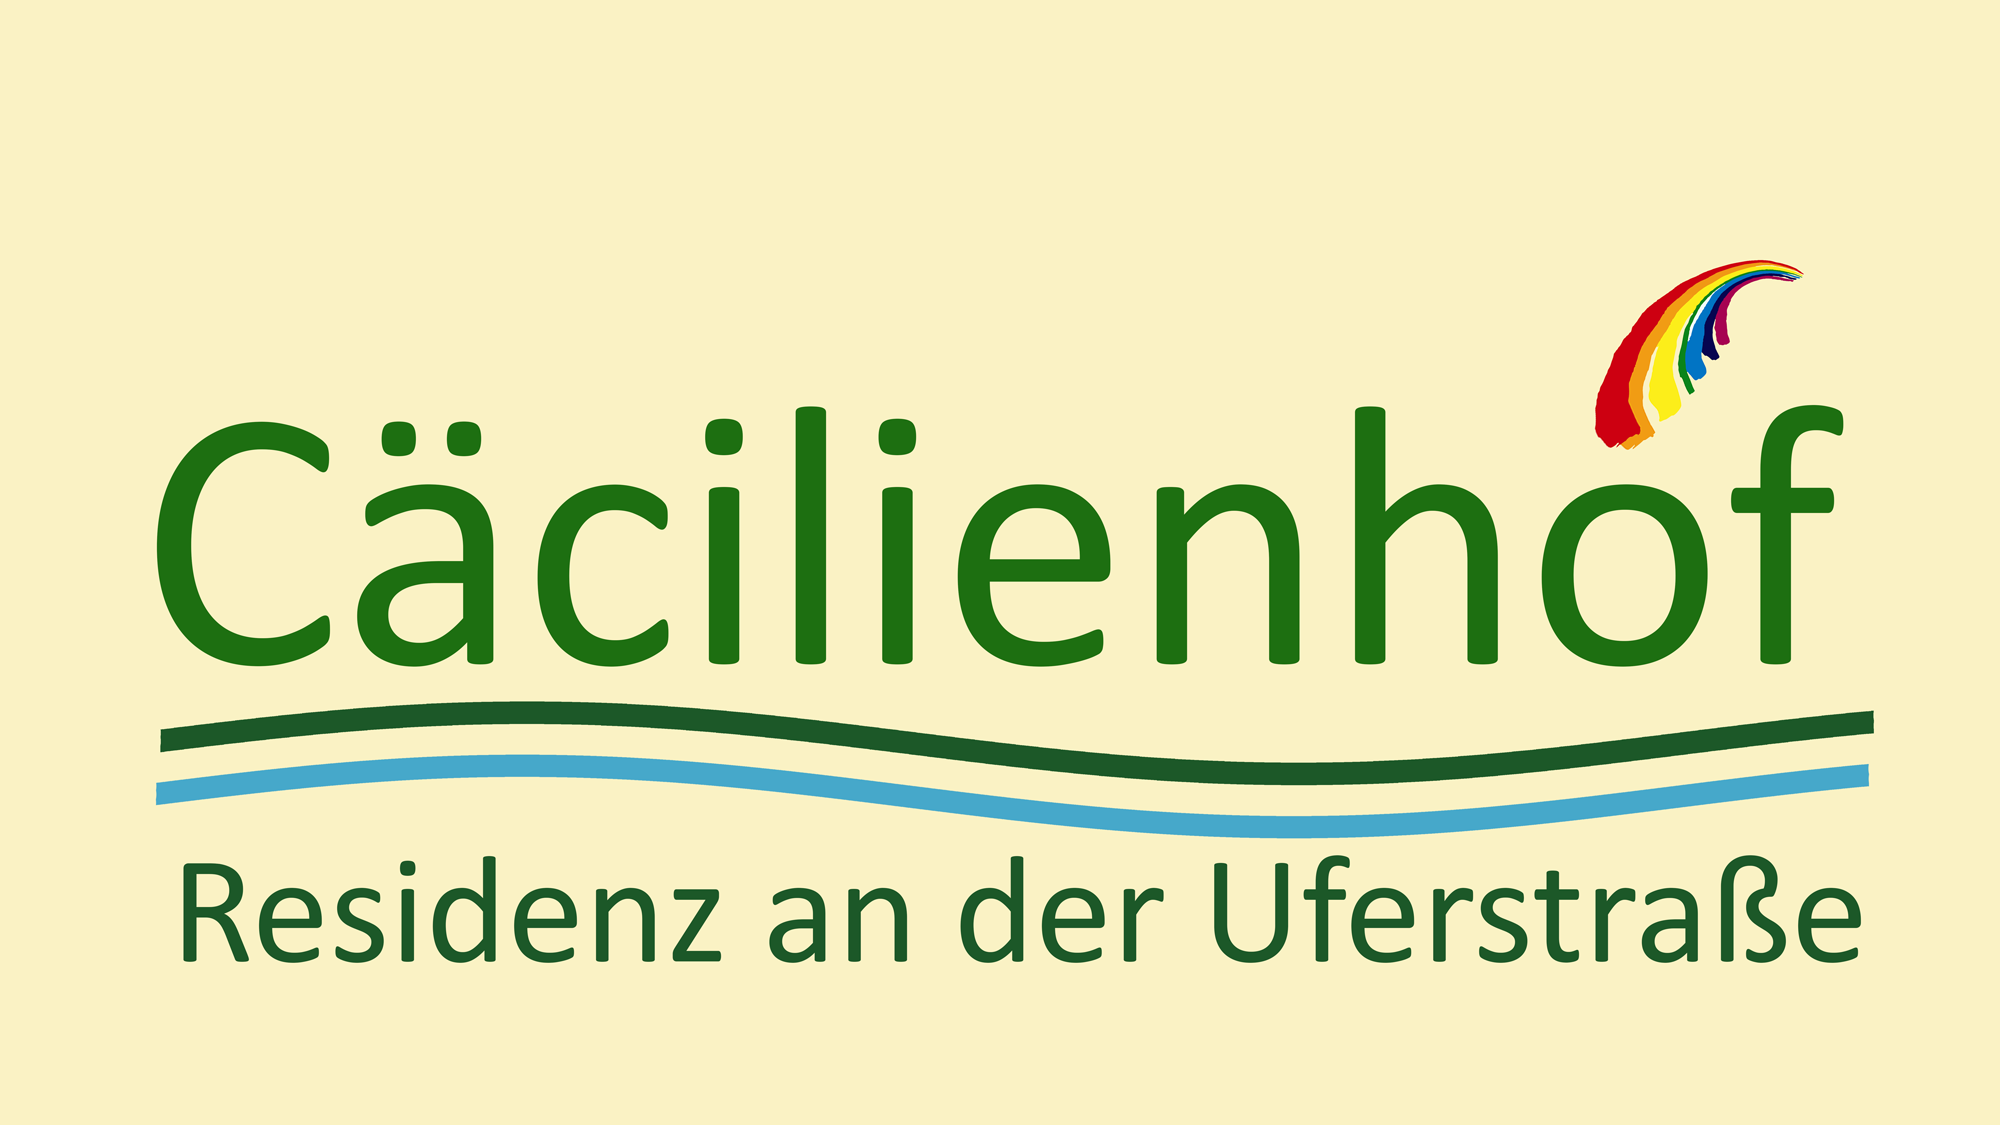 Cäcilienhof